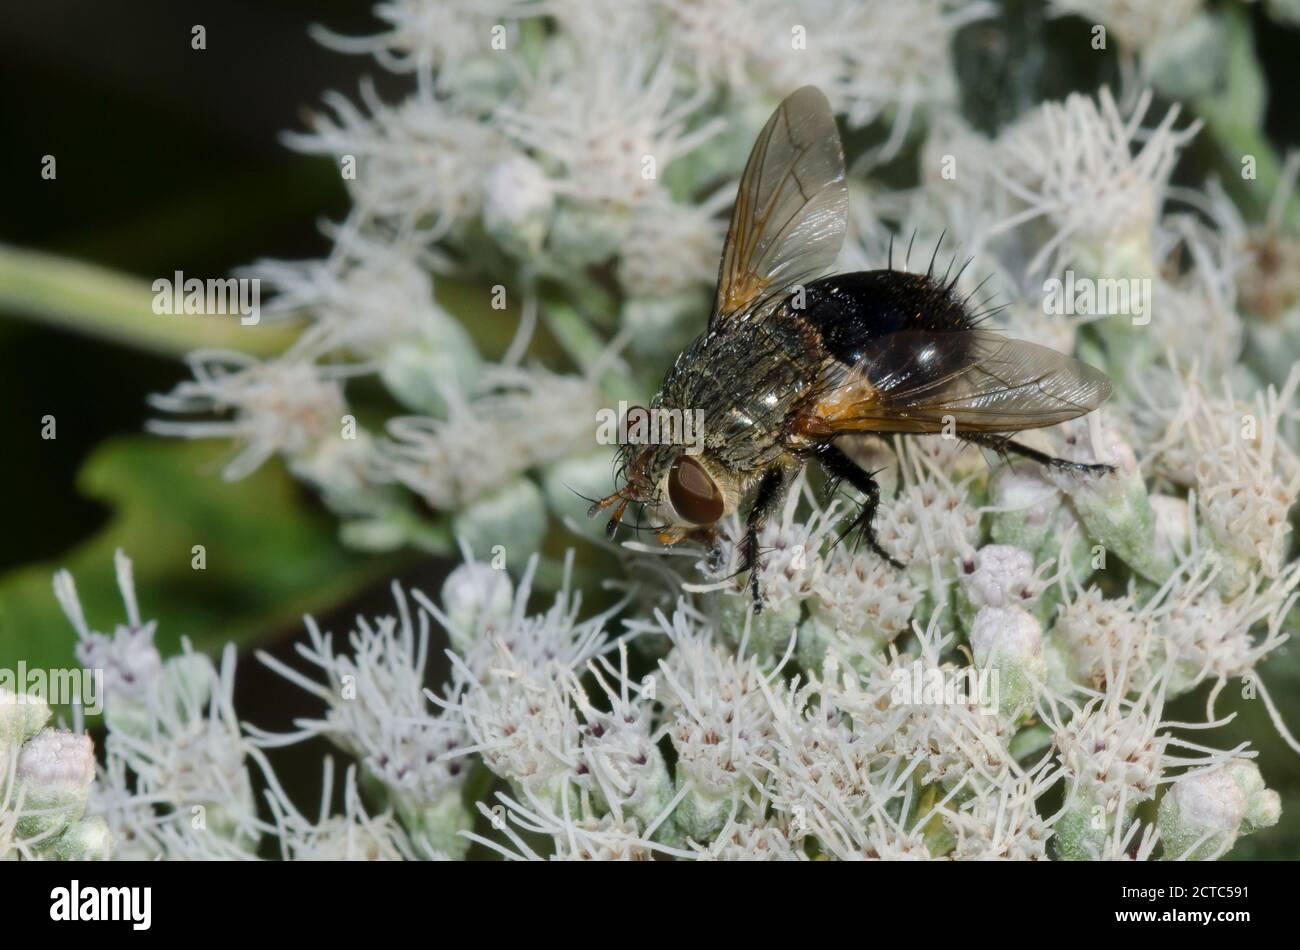 Tachinid Fly, Family Tachinidae, foraging on Lateflowering Thoroughwort, Eupatorium serotinum Stock Photo